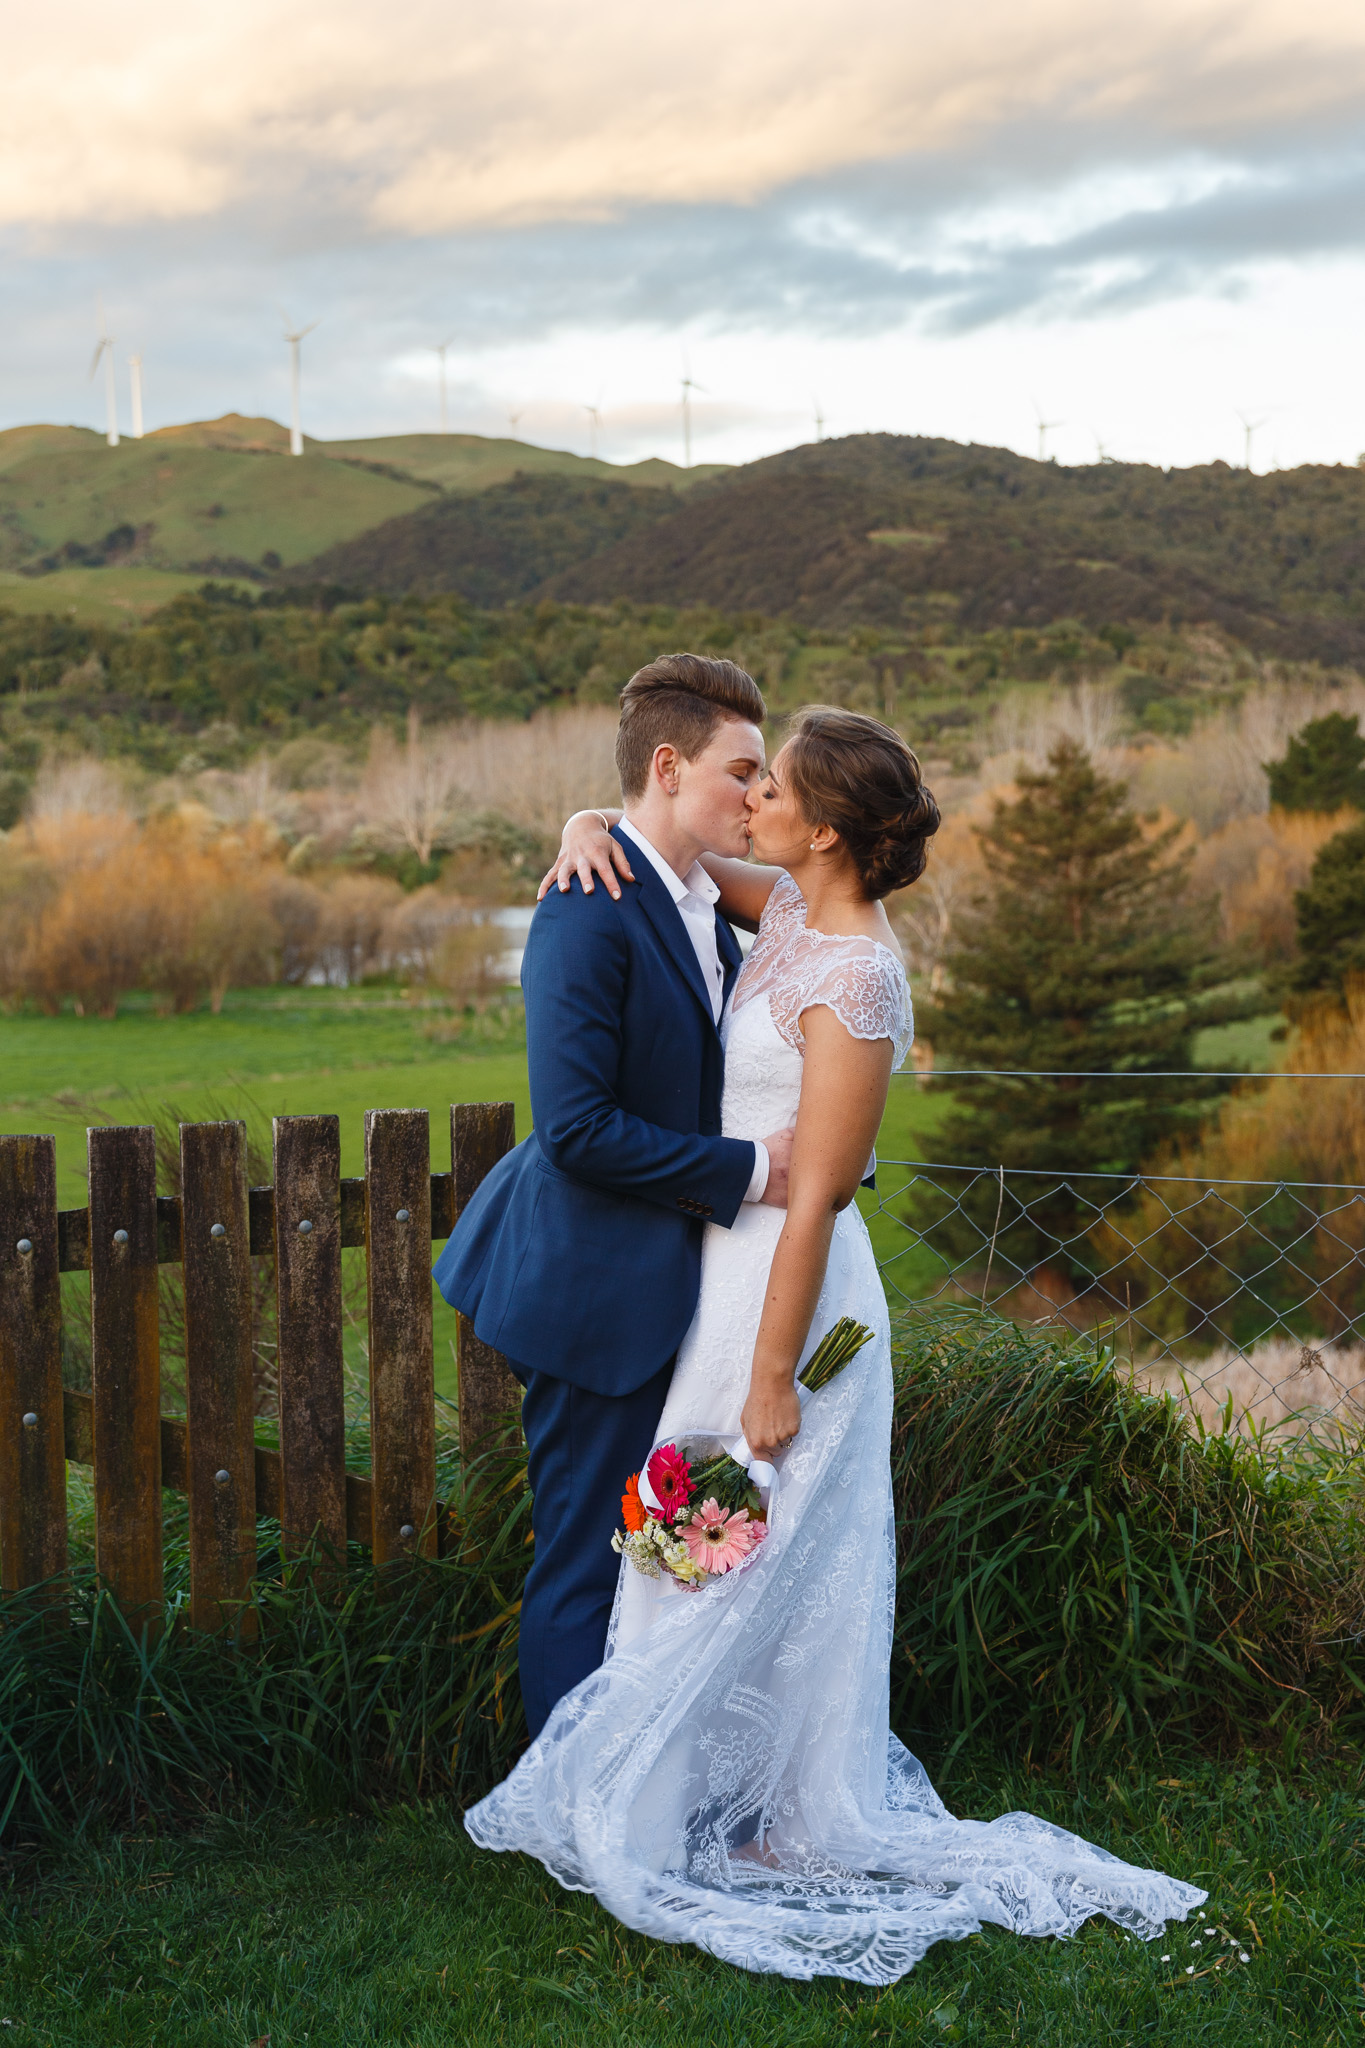 palmerston-north-wedding-photography-highlight-new-zealand.jpg-555.jpg